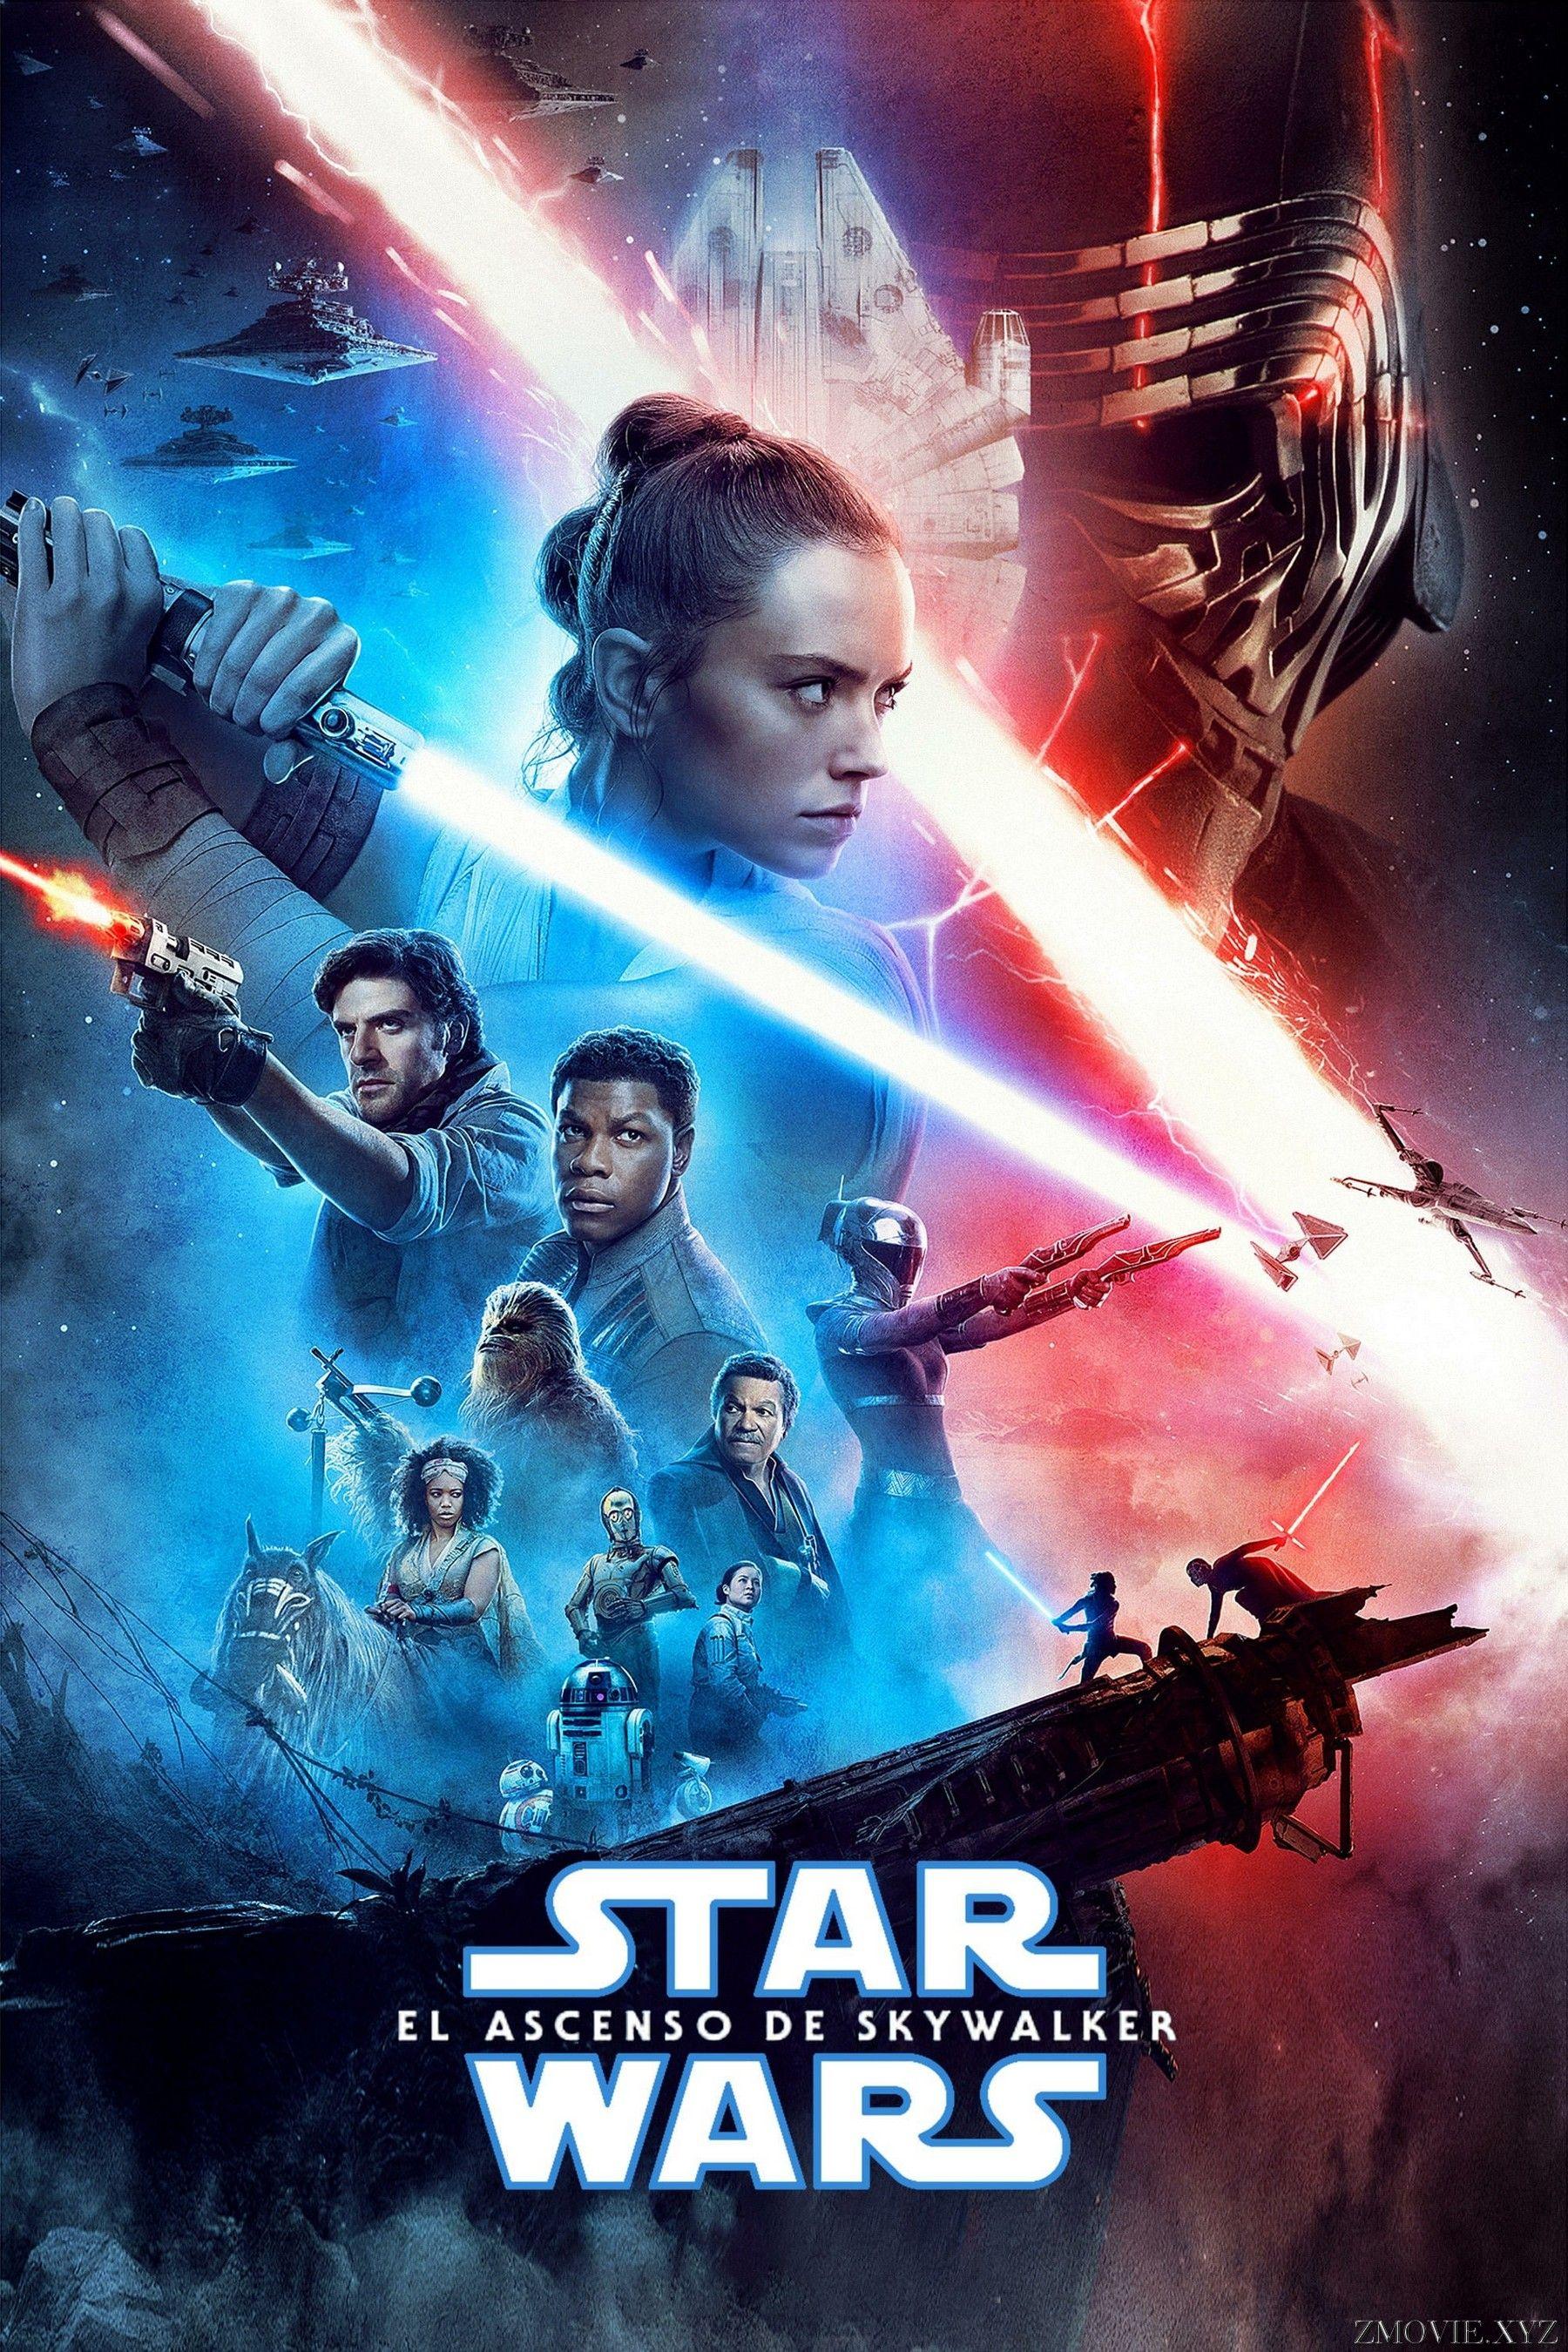 Star Wars El Ascenso De Skywalker Pelicula Completa En